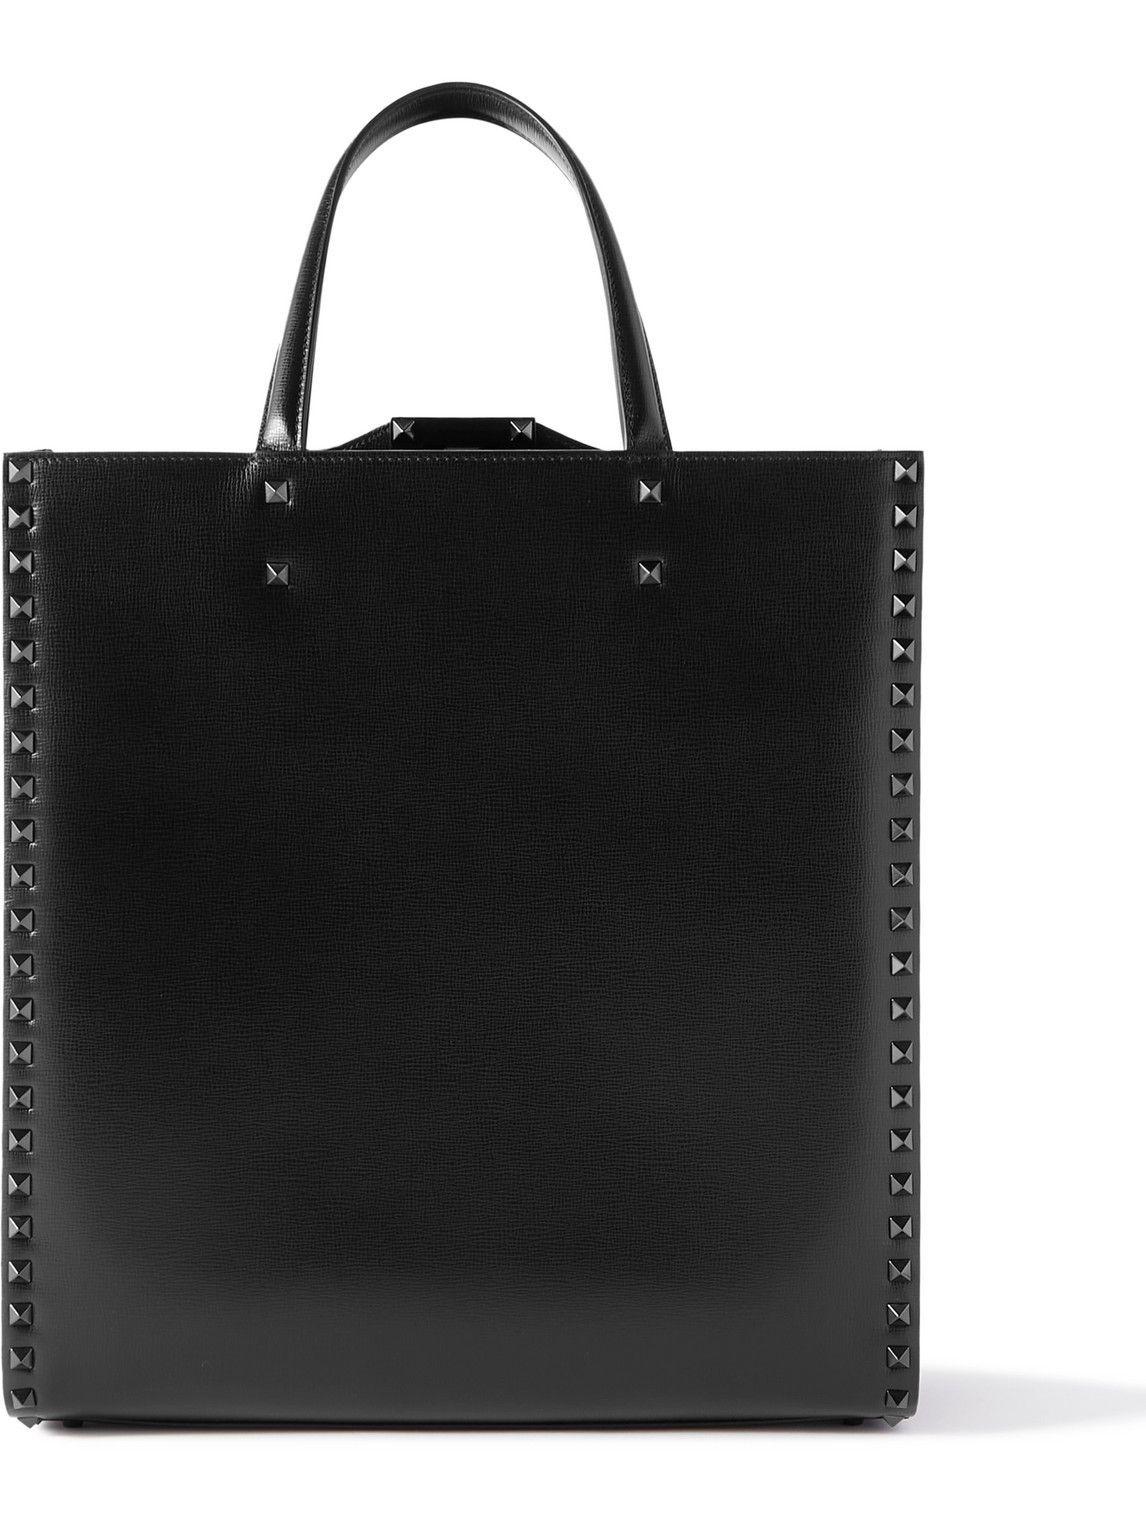 Photo: Valentino - Valentino Garavani Rockstud Leather Tote Bag